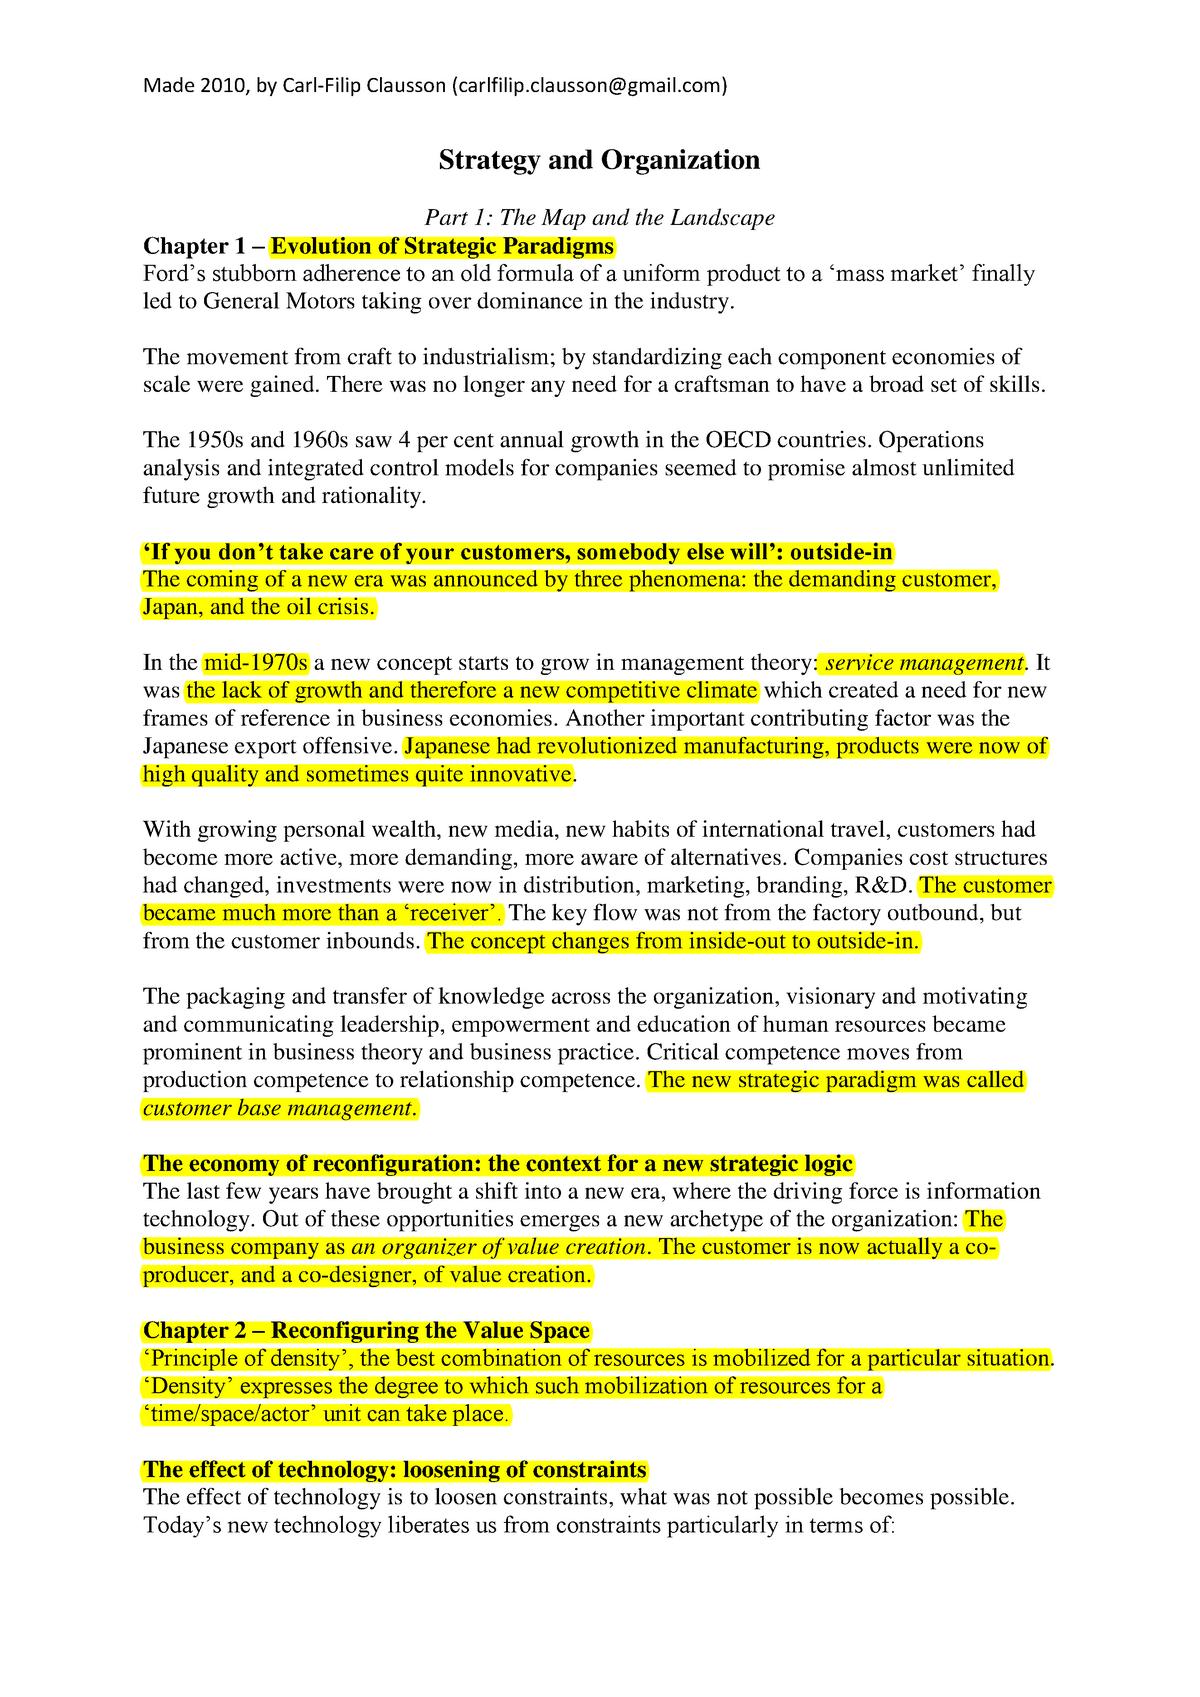 Reframing Business Summary - GM0803 - StuDocu